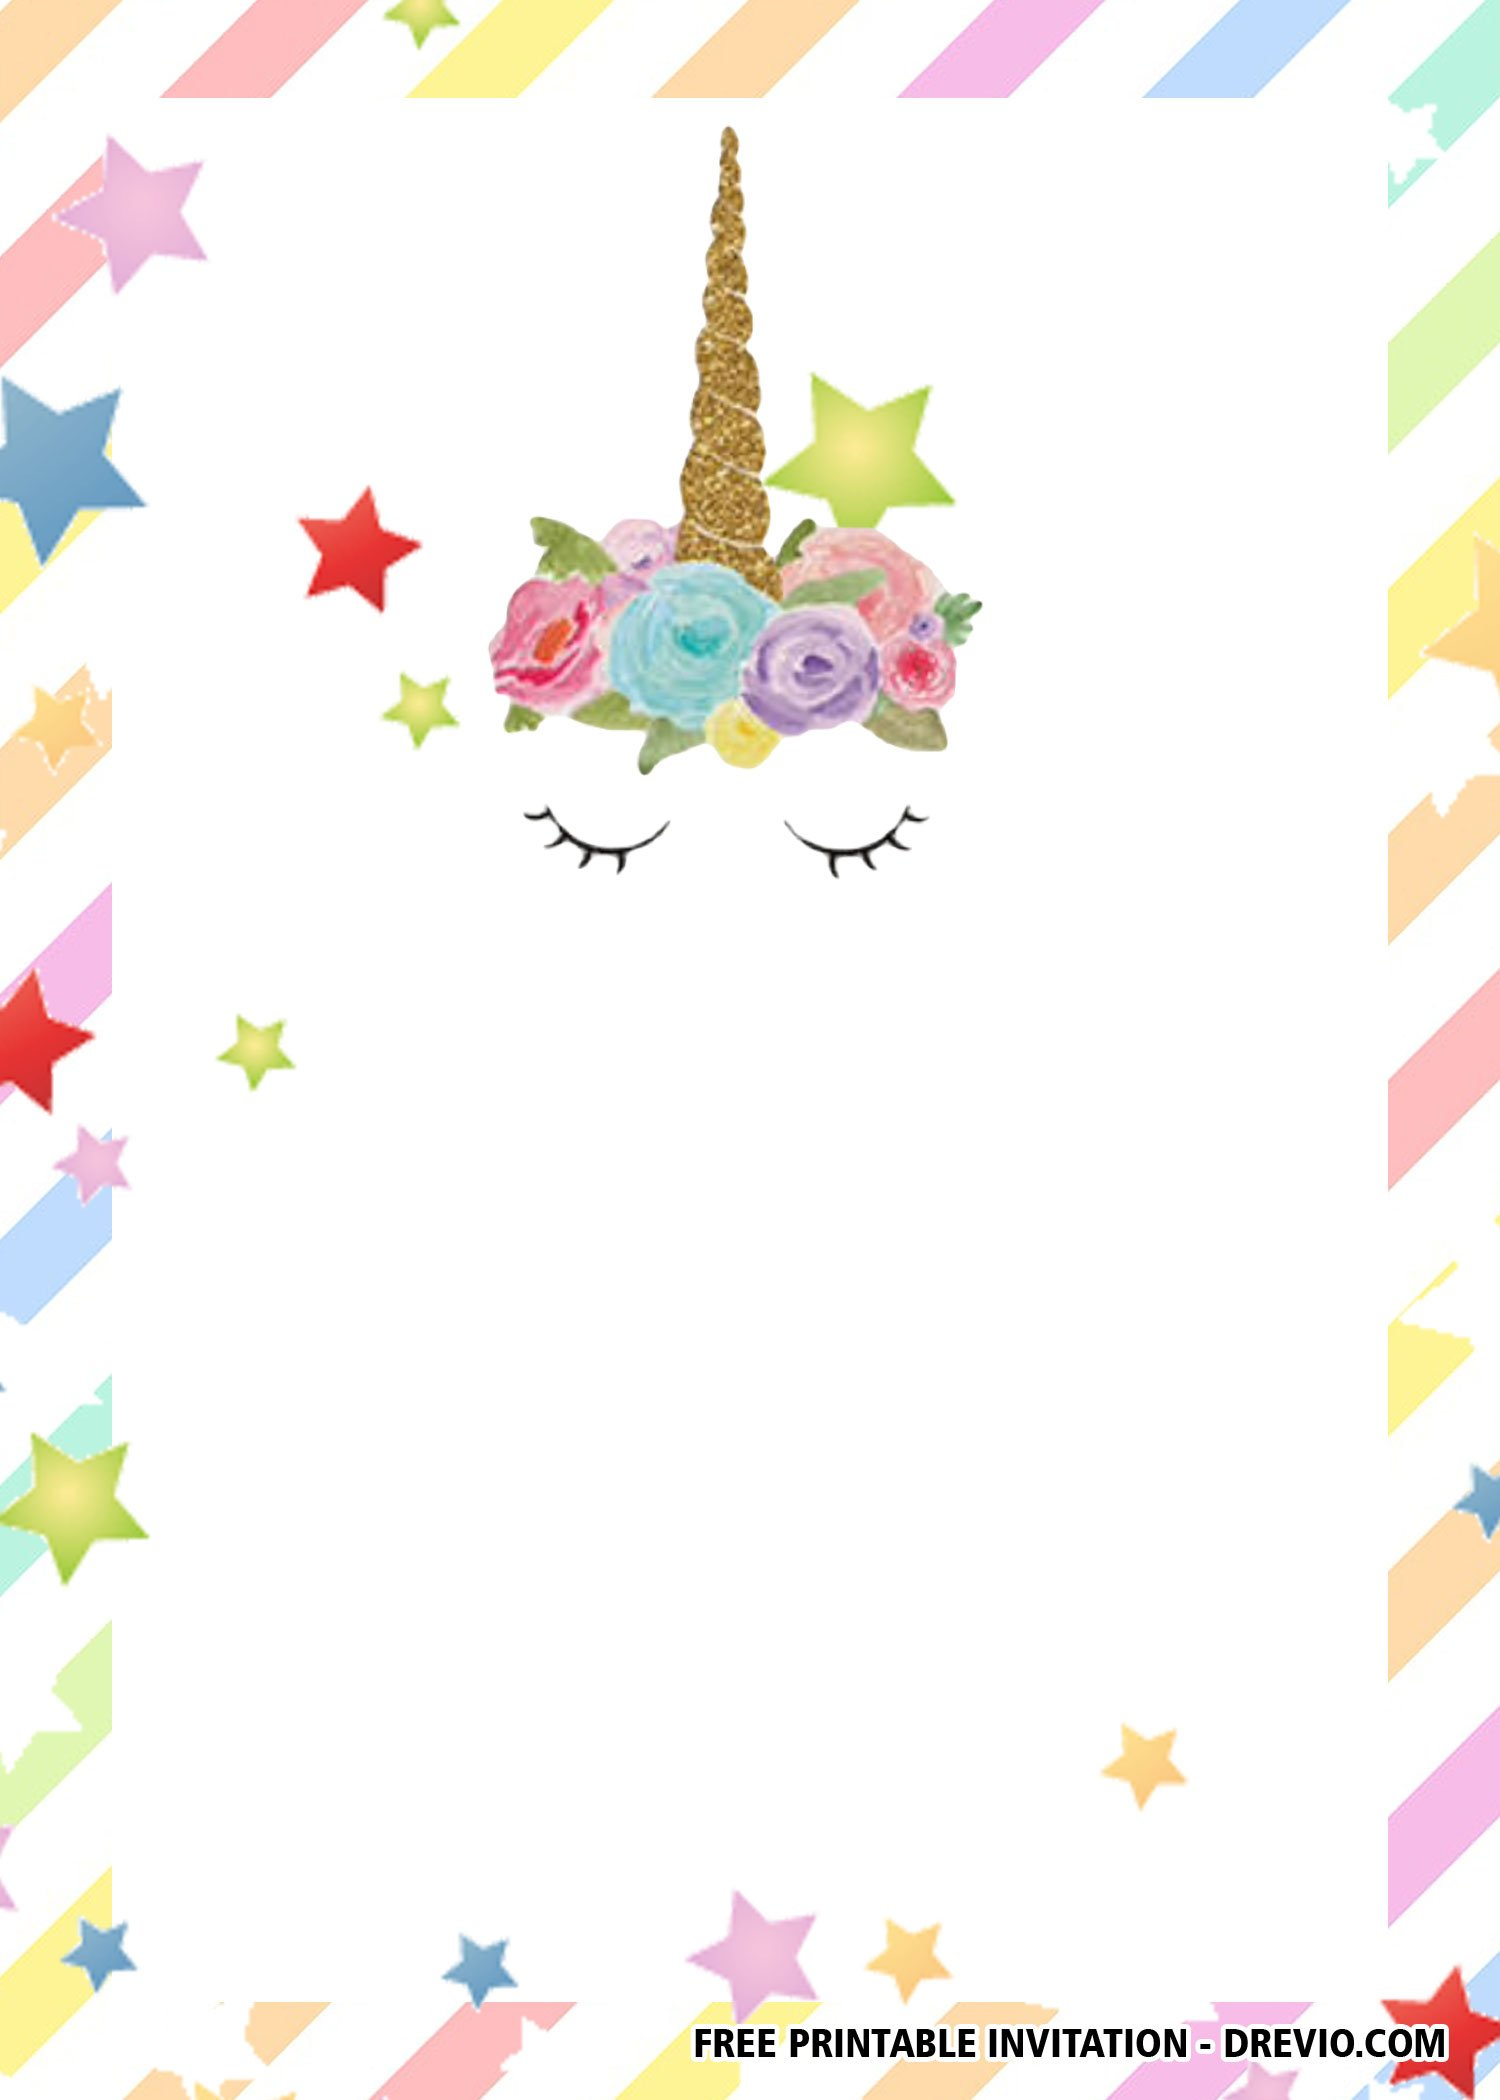 Free Printable Seamless Unicorn Invitation Templates